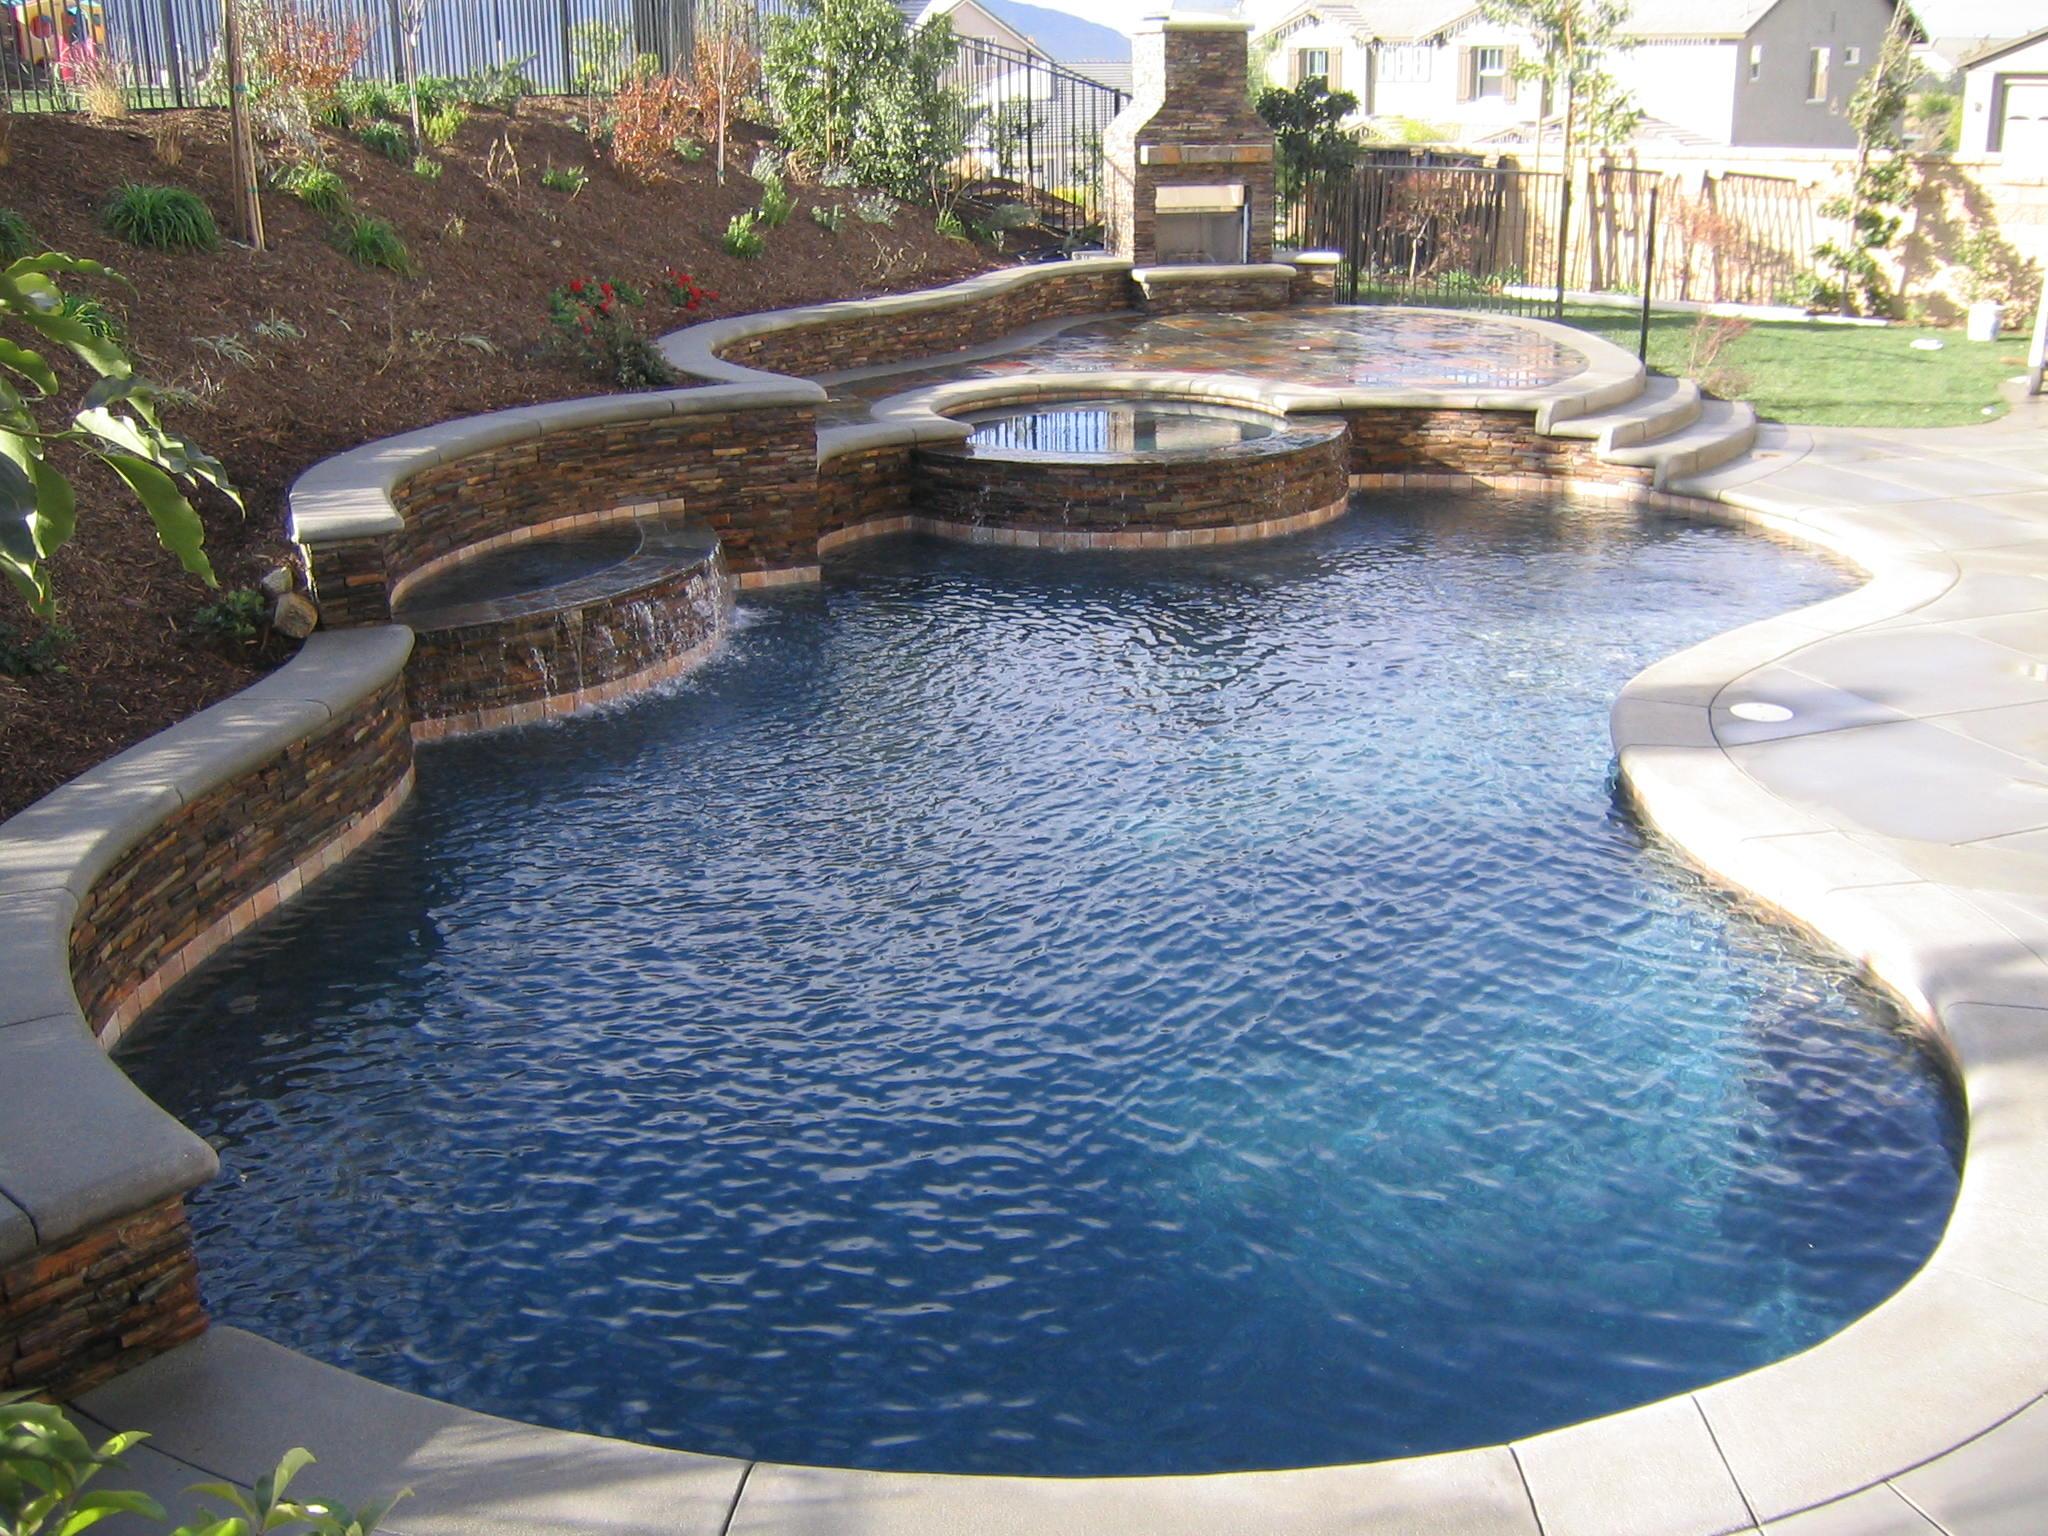 35 Best Backyard Pool Ideas on Cool Backyard Decorations id=46752